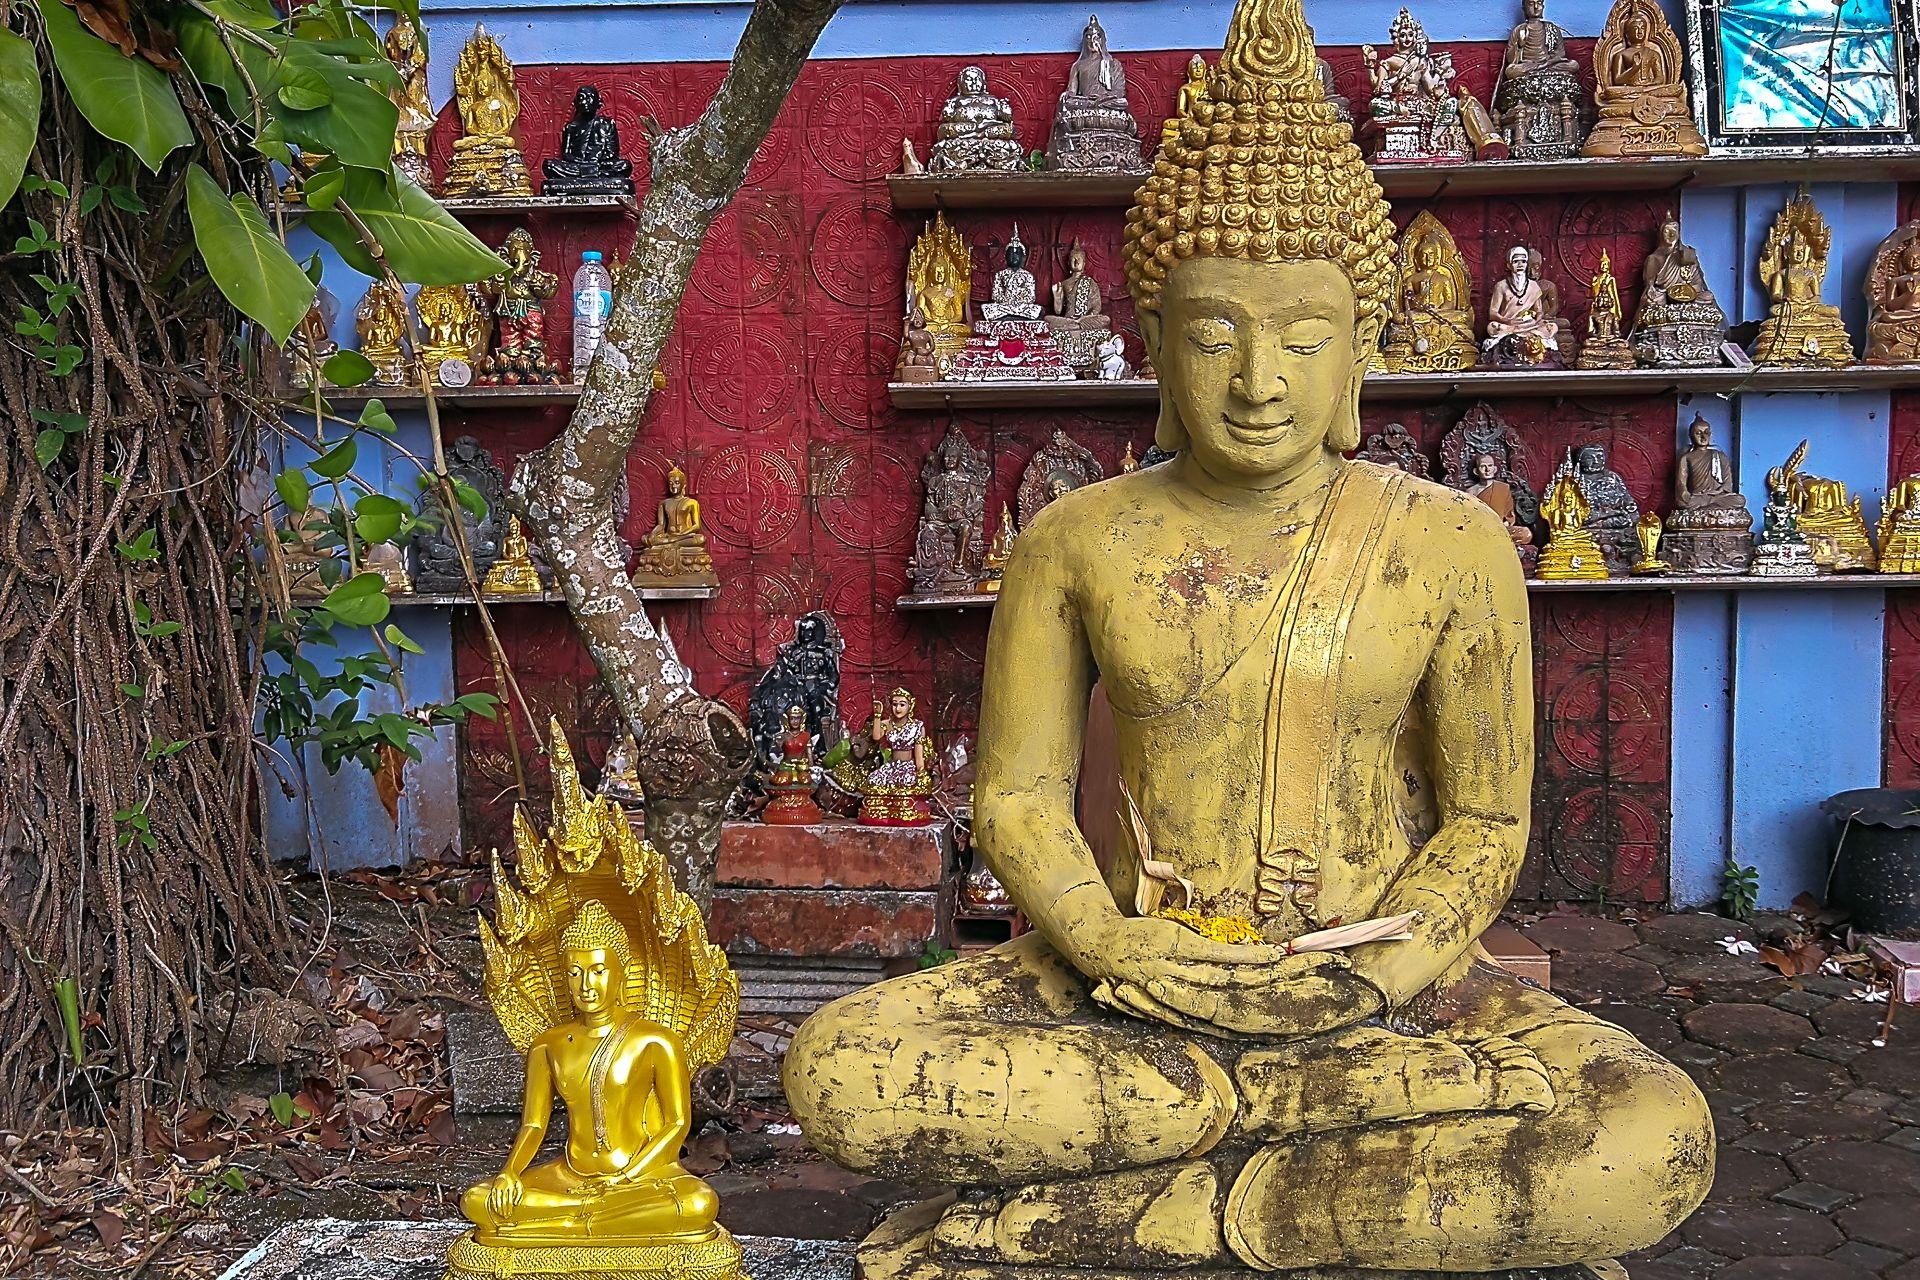 Wat Kunaram, Ват Кунарам, мумия, мумифицированный монах, монах, буддизм, Самуи, Тайланд, Таиланд, Samui, mummy, monk